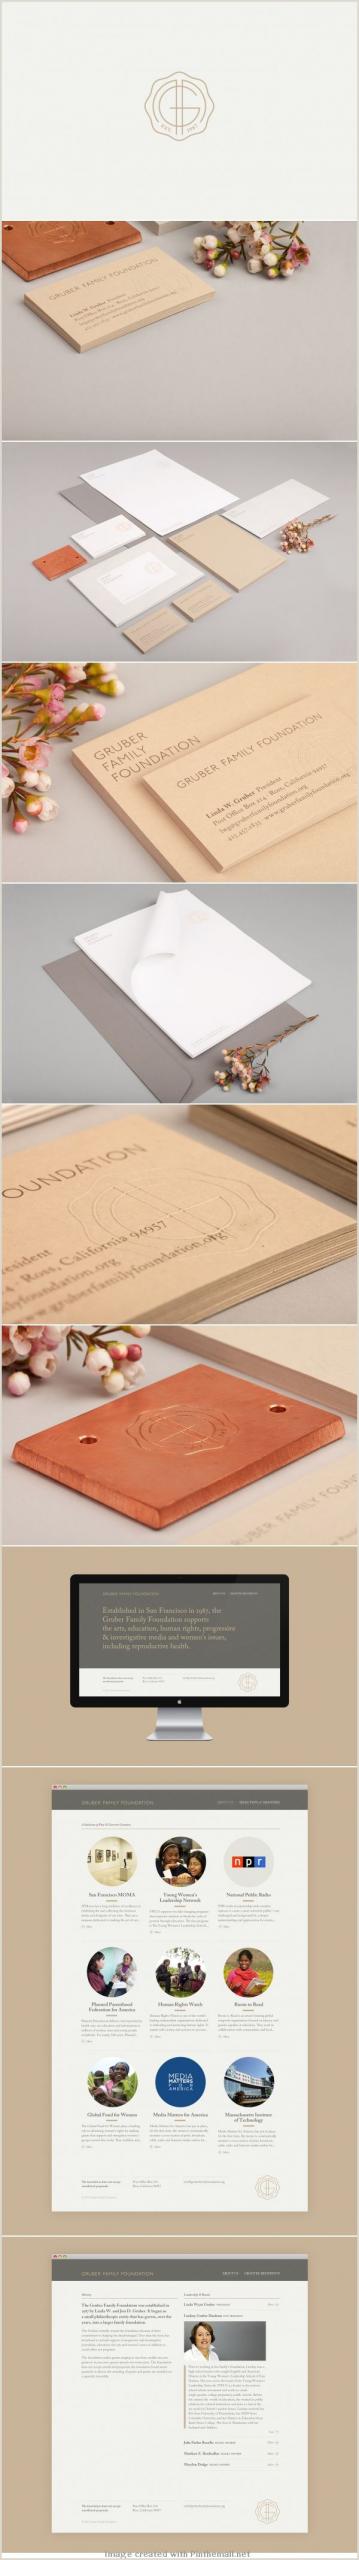 Business Cards Inspiration 14 Popular Hardwood Flooring Business Card Template